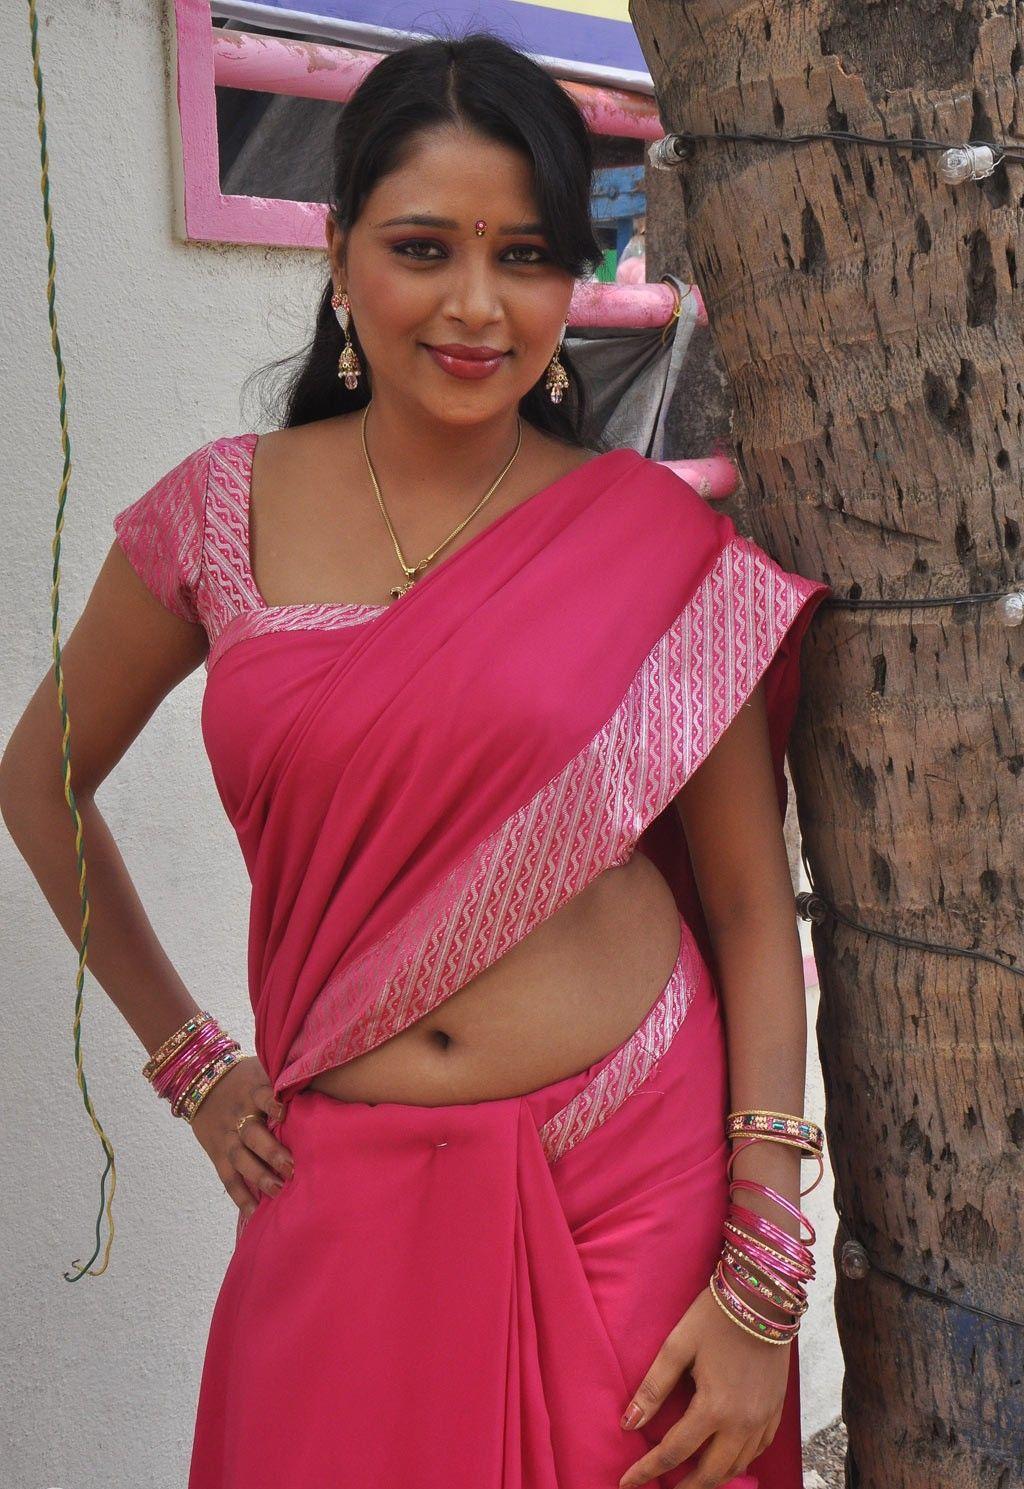 ... Grade http://www.kochukeralam.in/actress/mallu-bgrade-actress-in-saree